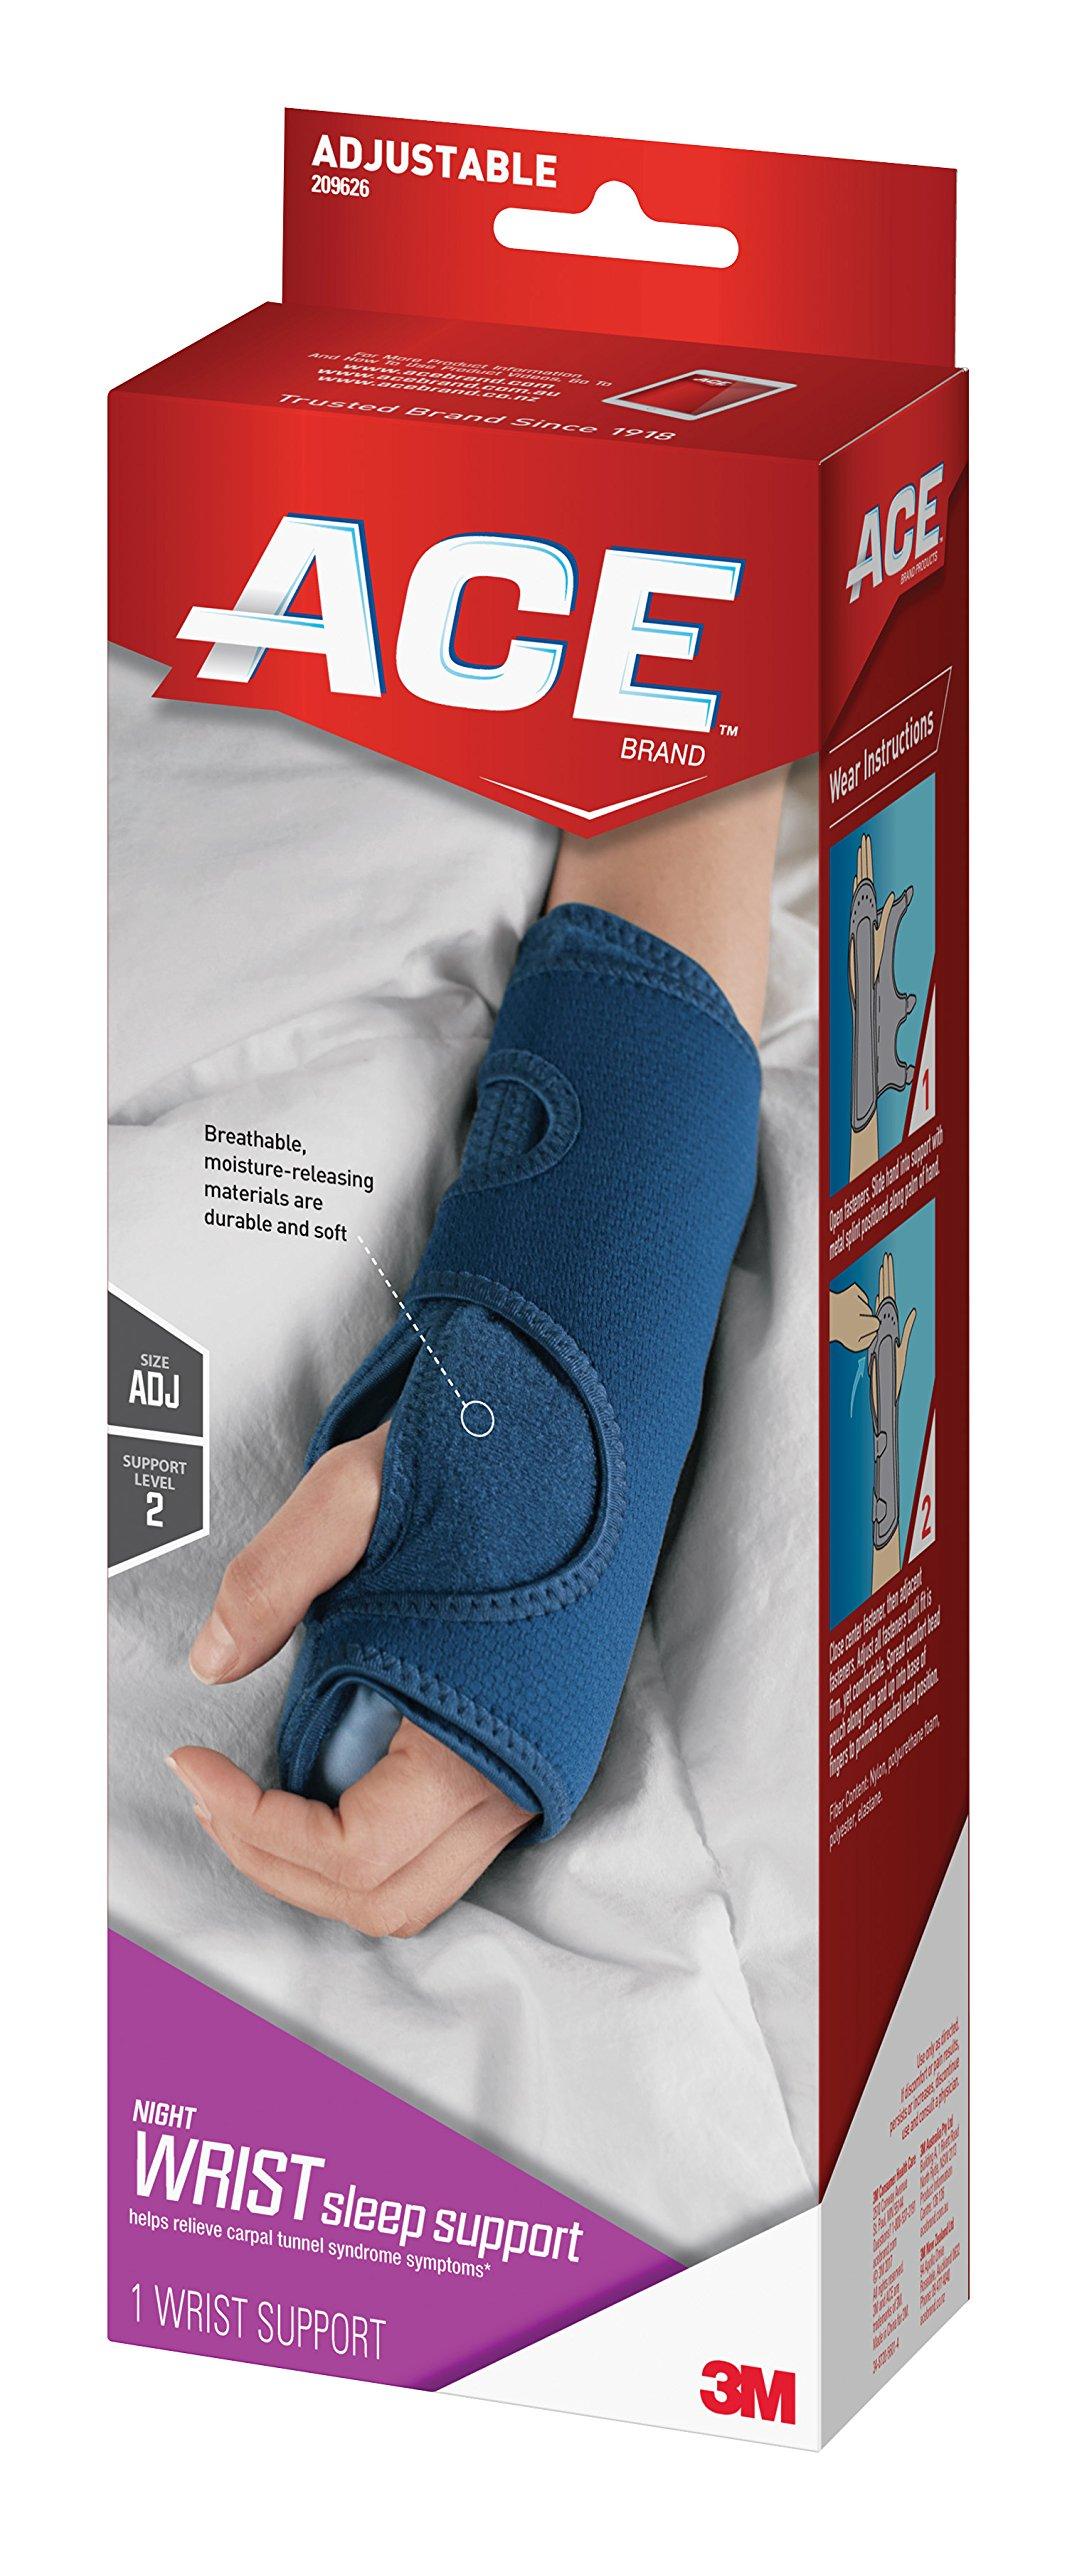 ACE Brand Night Wrist Sleep Support